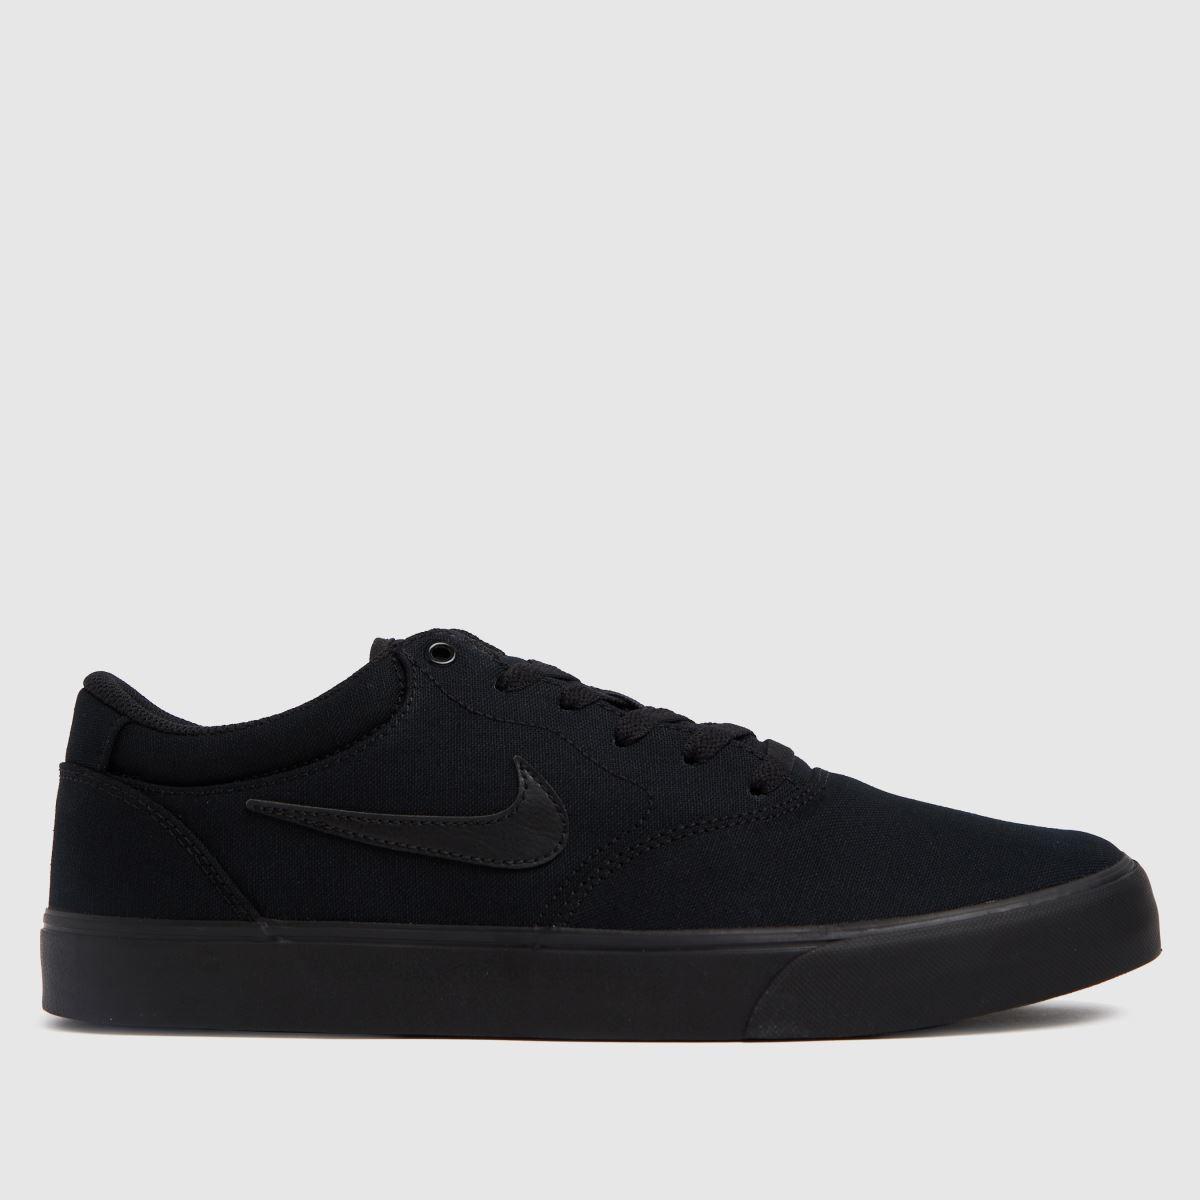 Nike SB Black Chron 2 Trainers